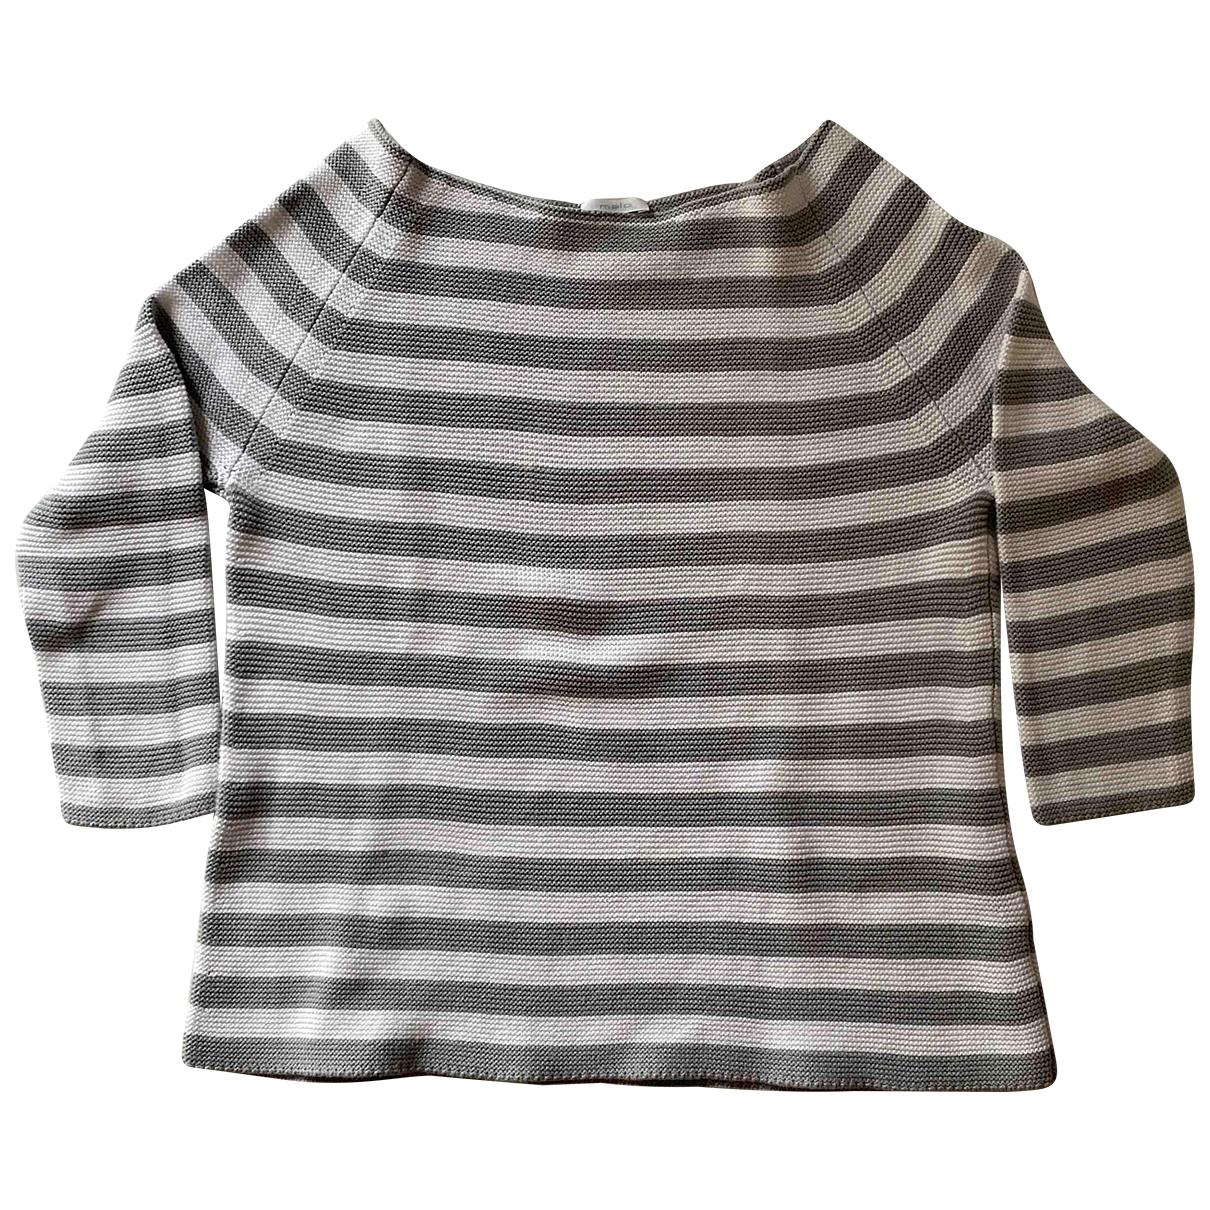 Malo \N Pullover in  Bunt Baumwolle